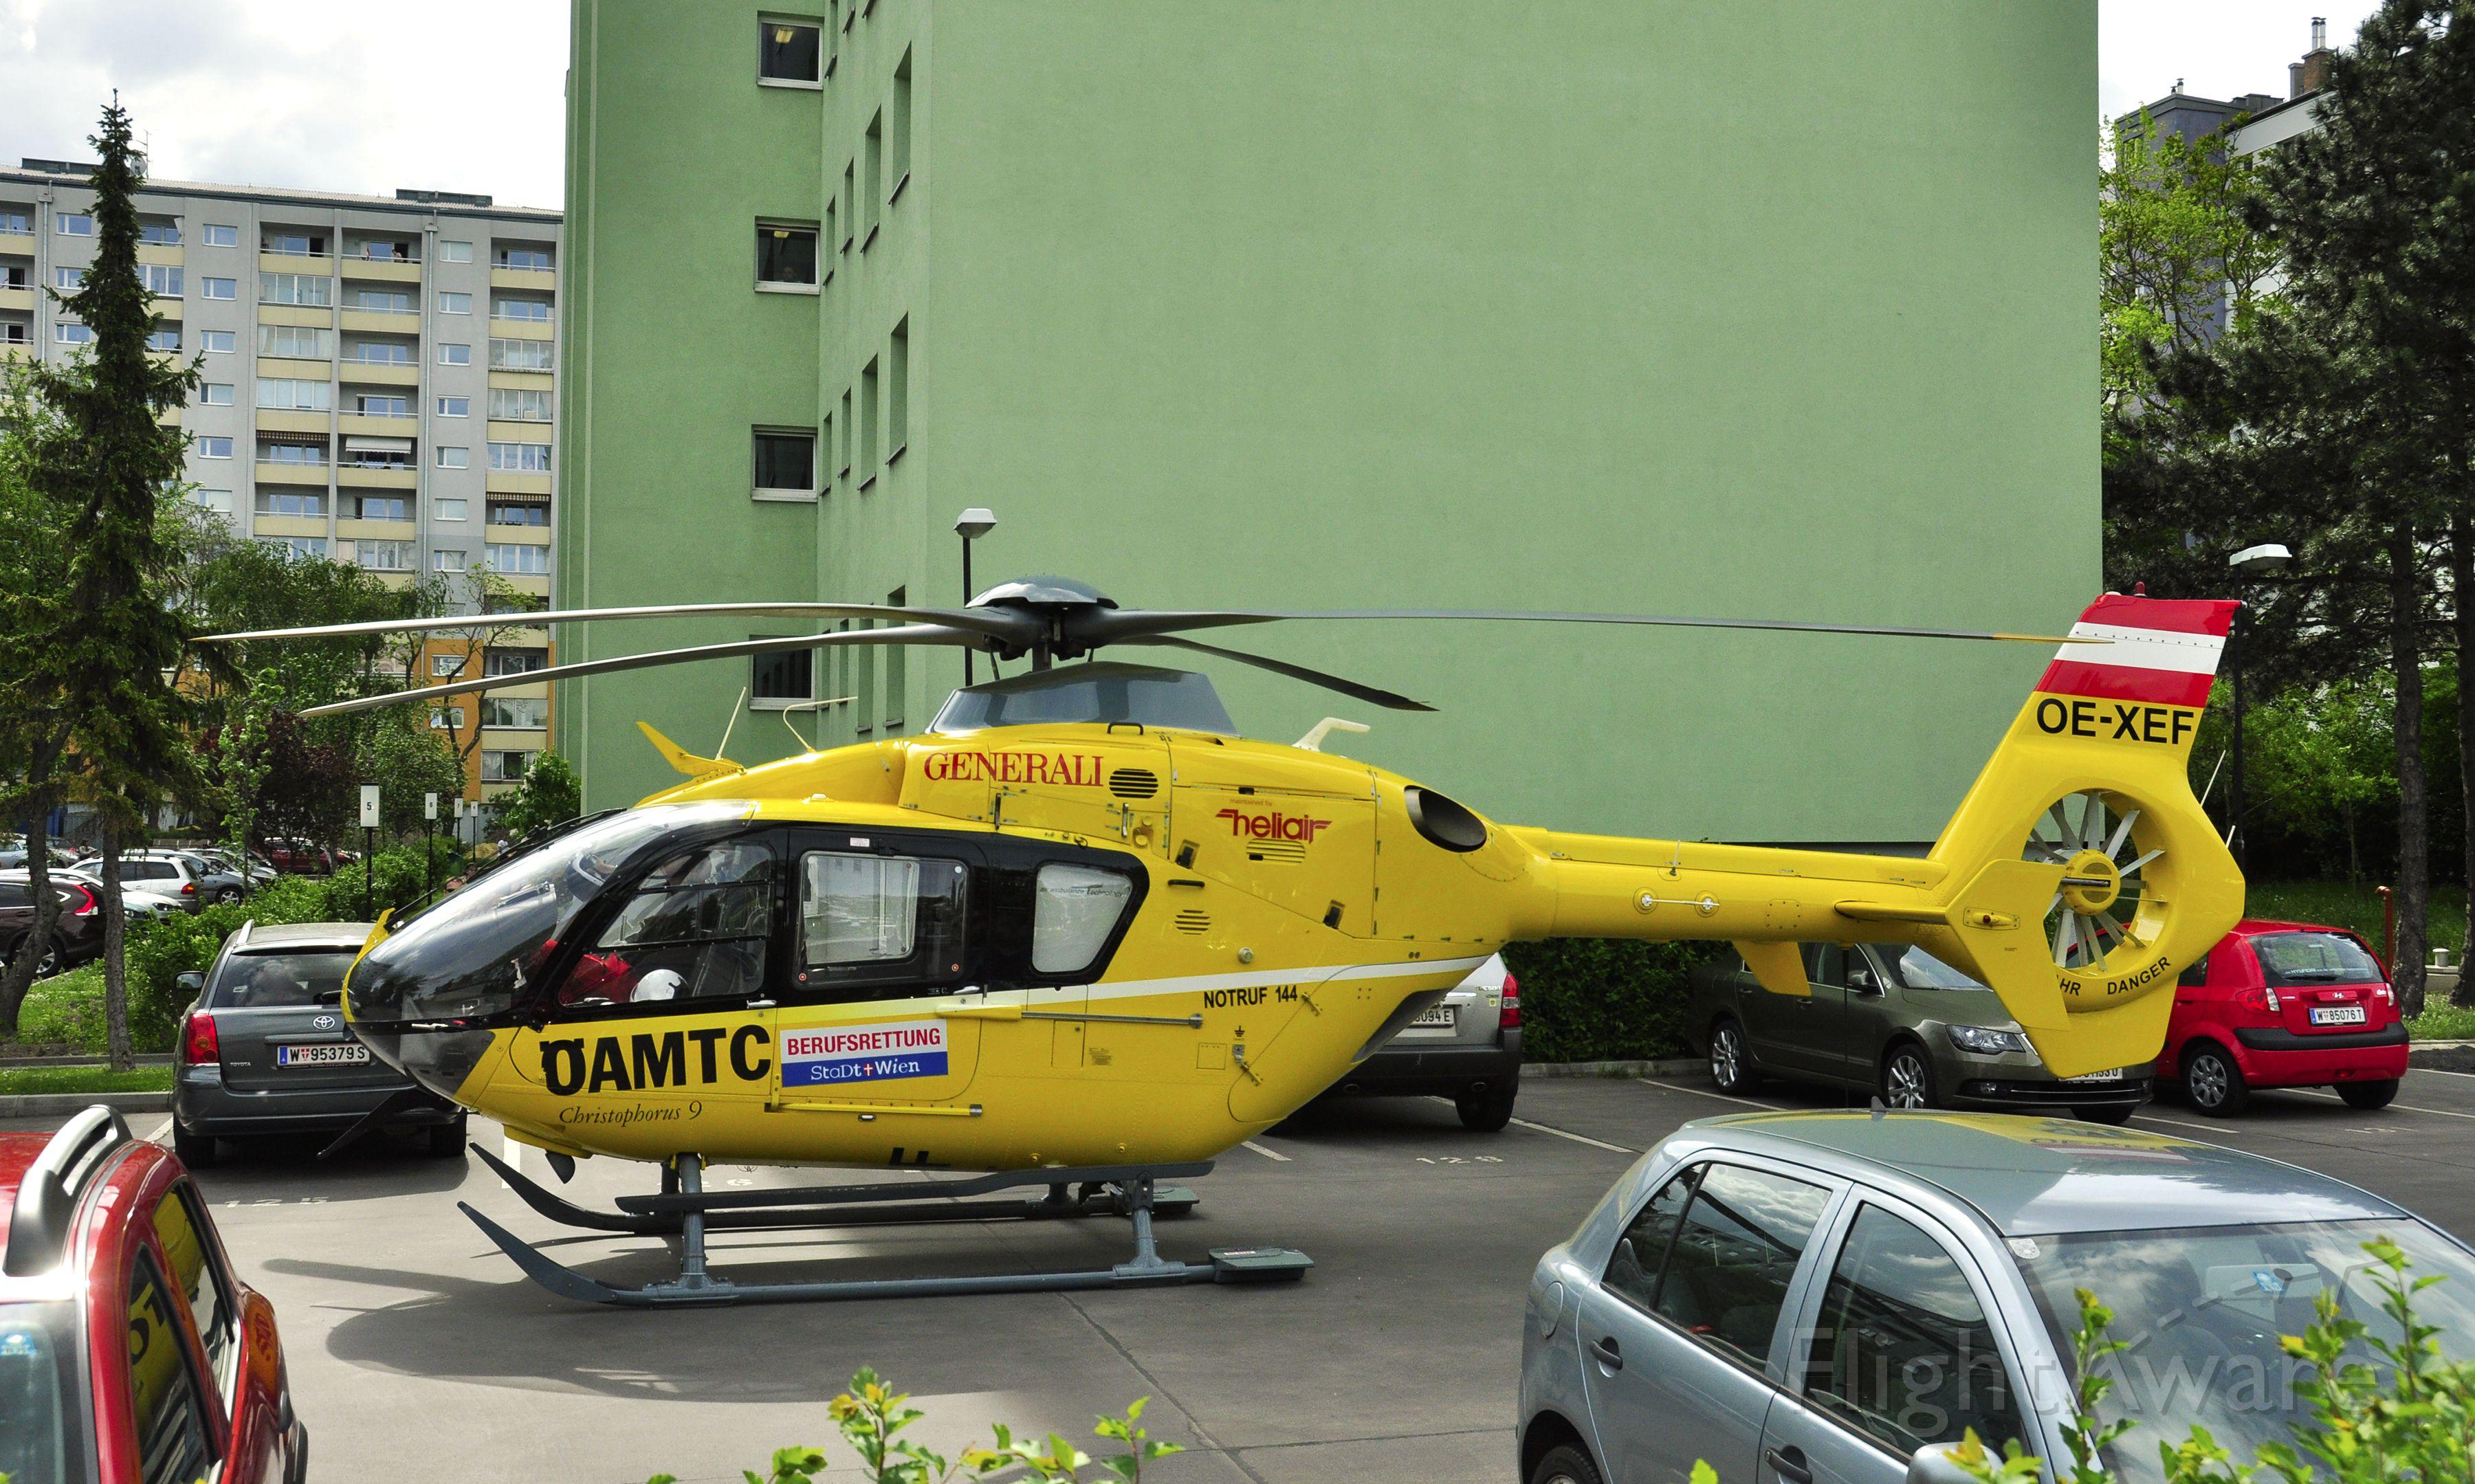 Eurocopter EC-635 (OE-XEF) - Christophorus Flugrettungsverein (ÖAMTC) Eurocopter EC135 T1 OE-XEF in a residential parking in Vienna town